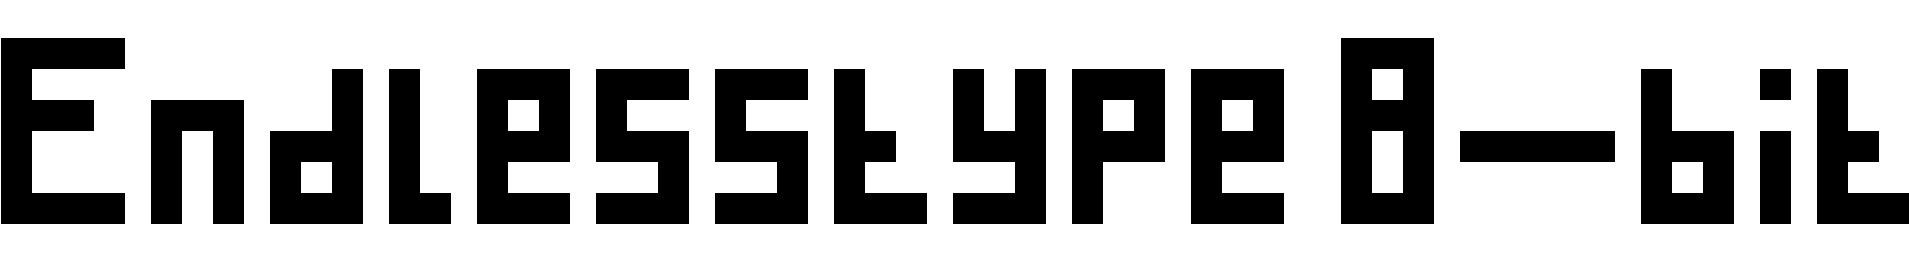 Endlesstype 8-bit